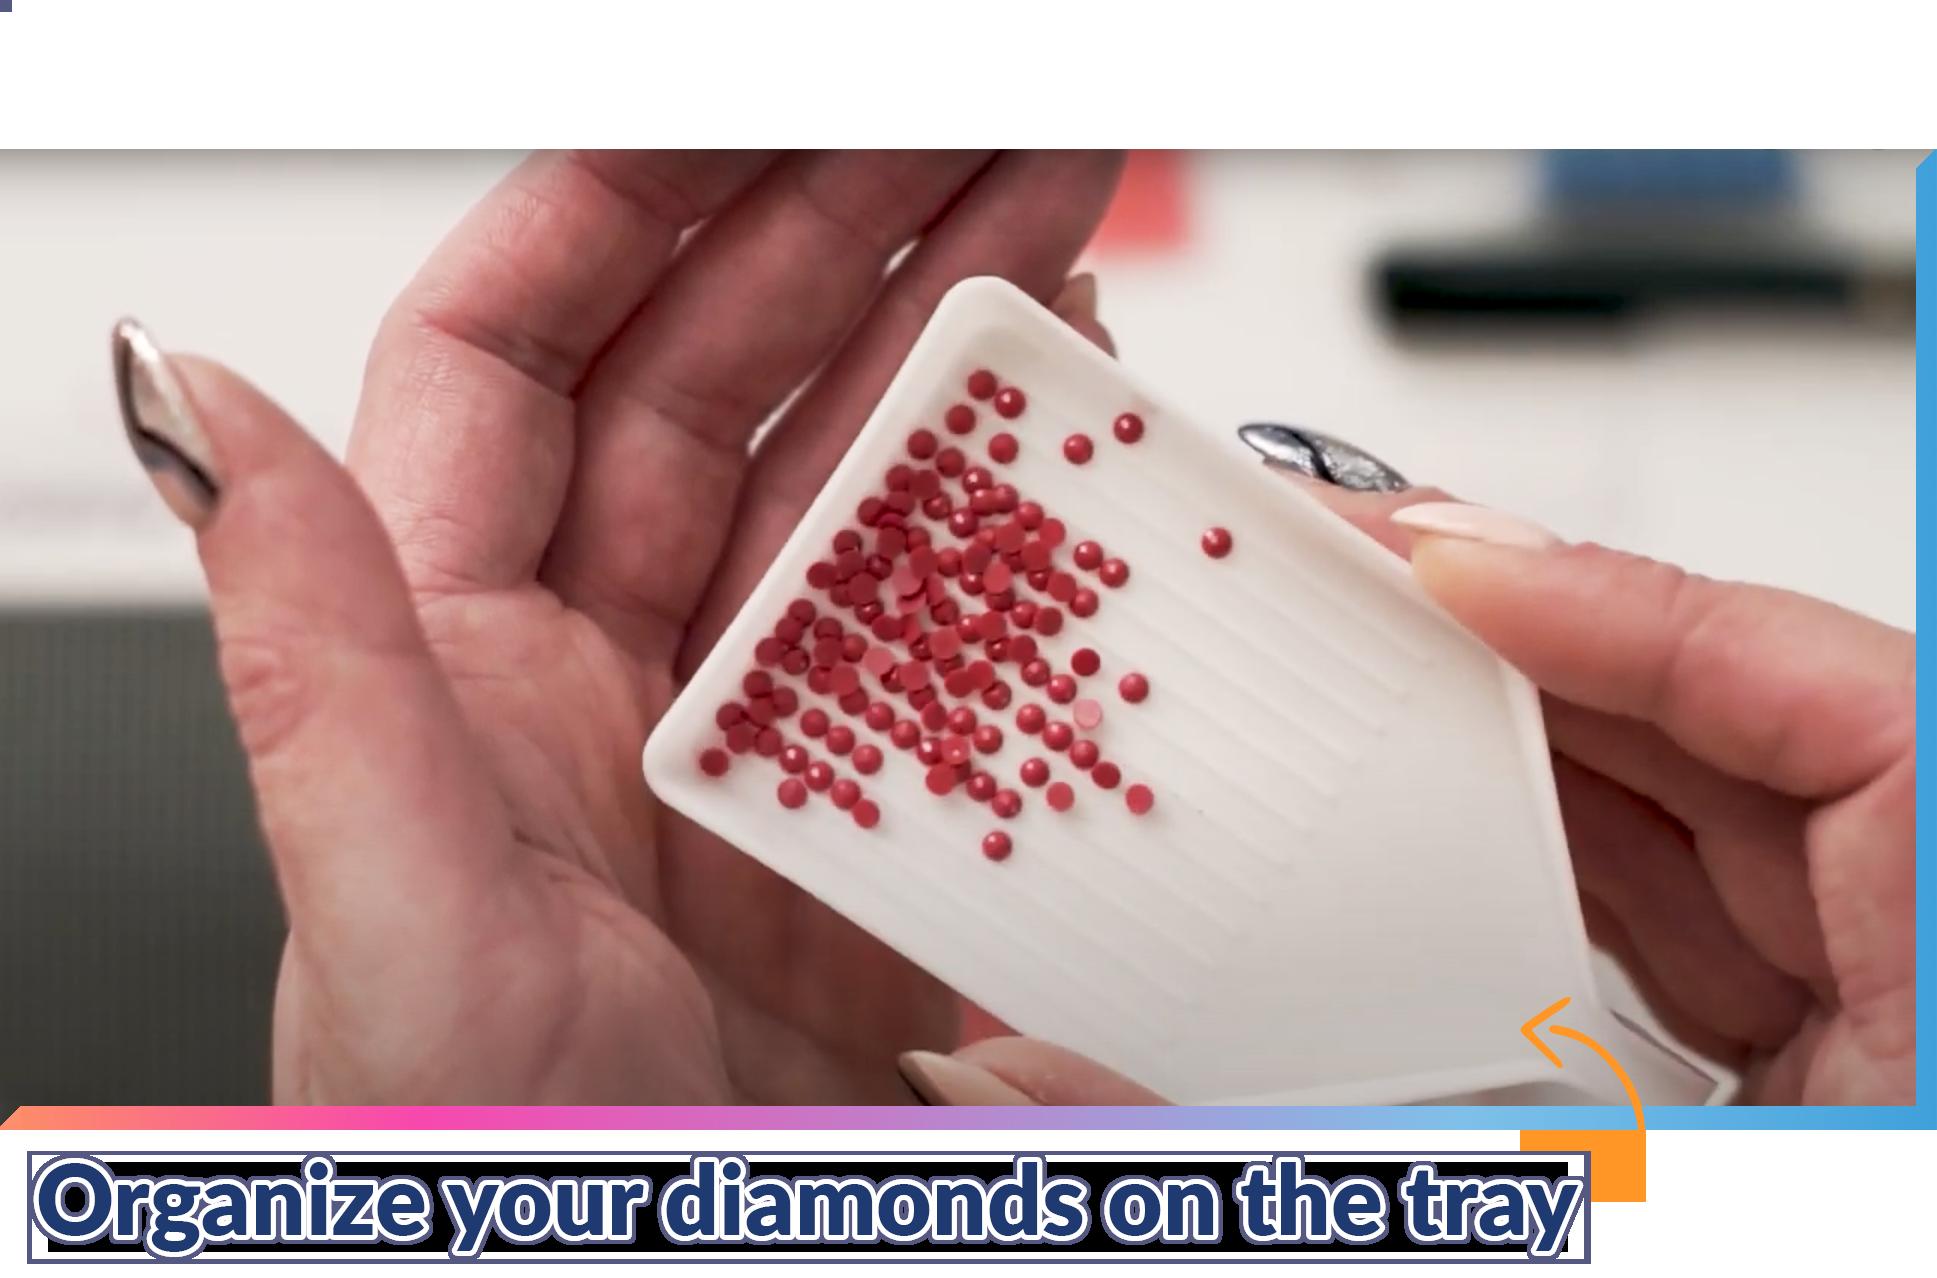 Line up your diamonds.